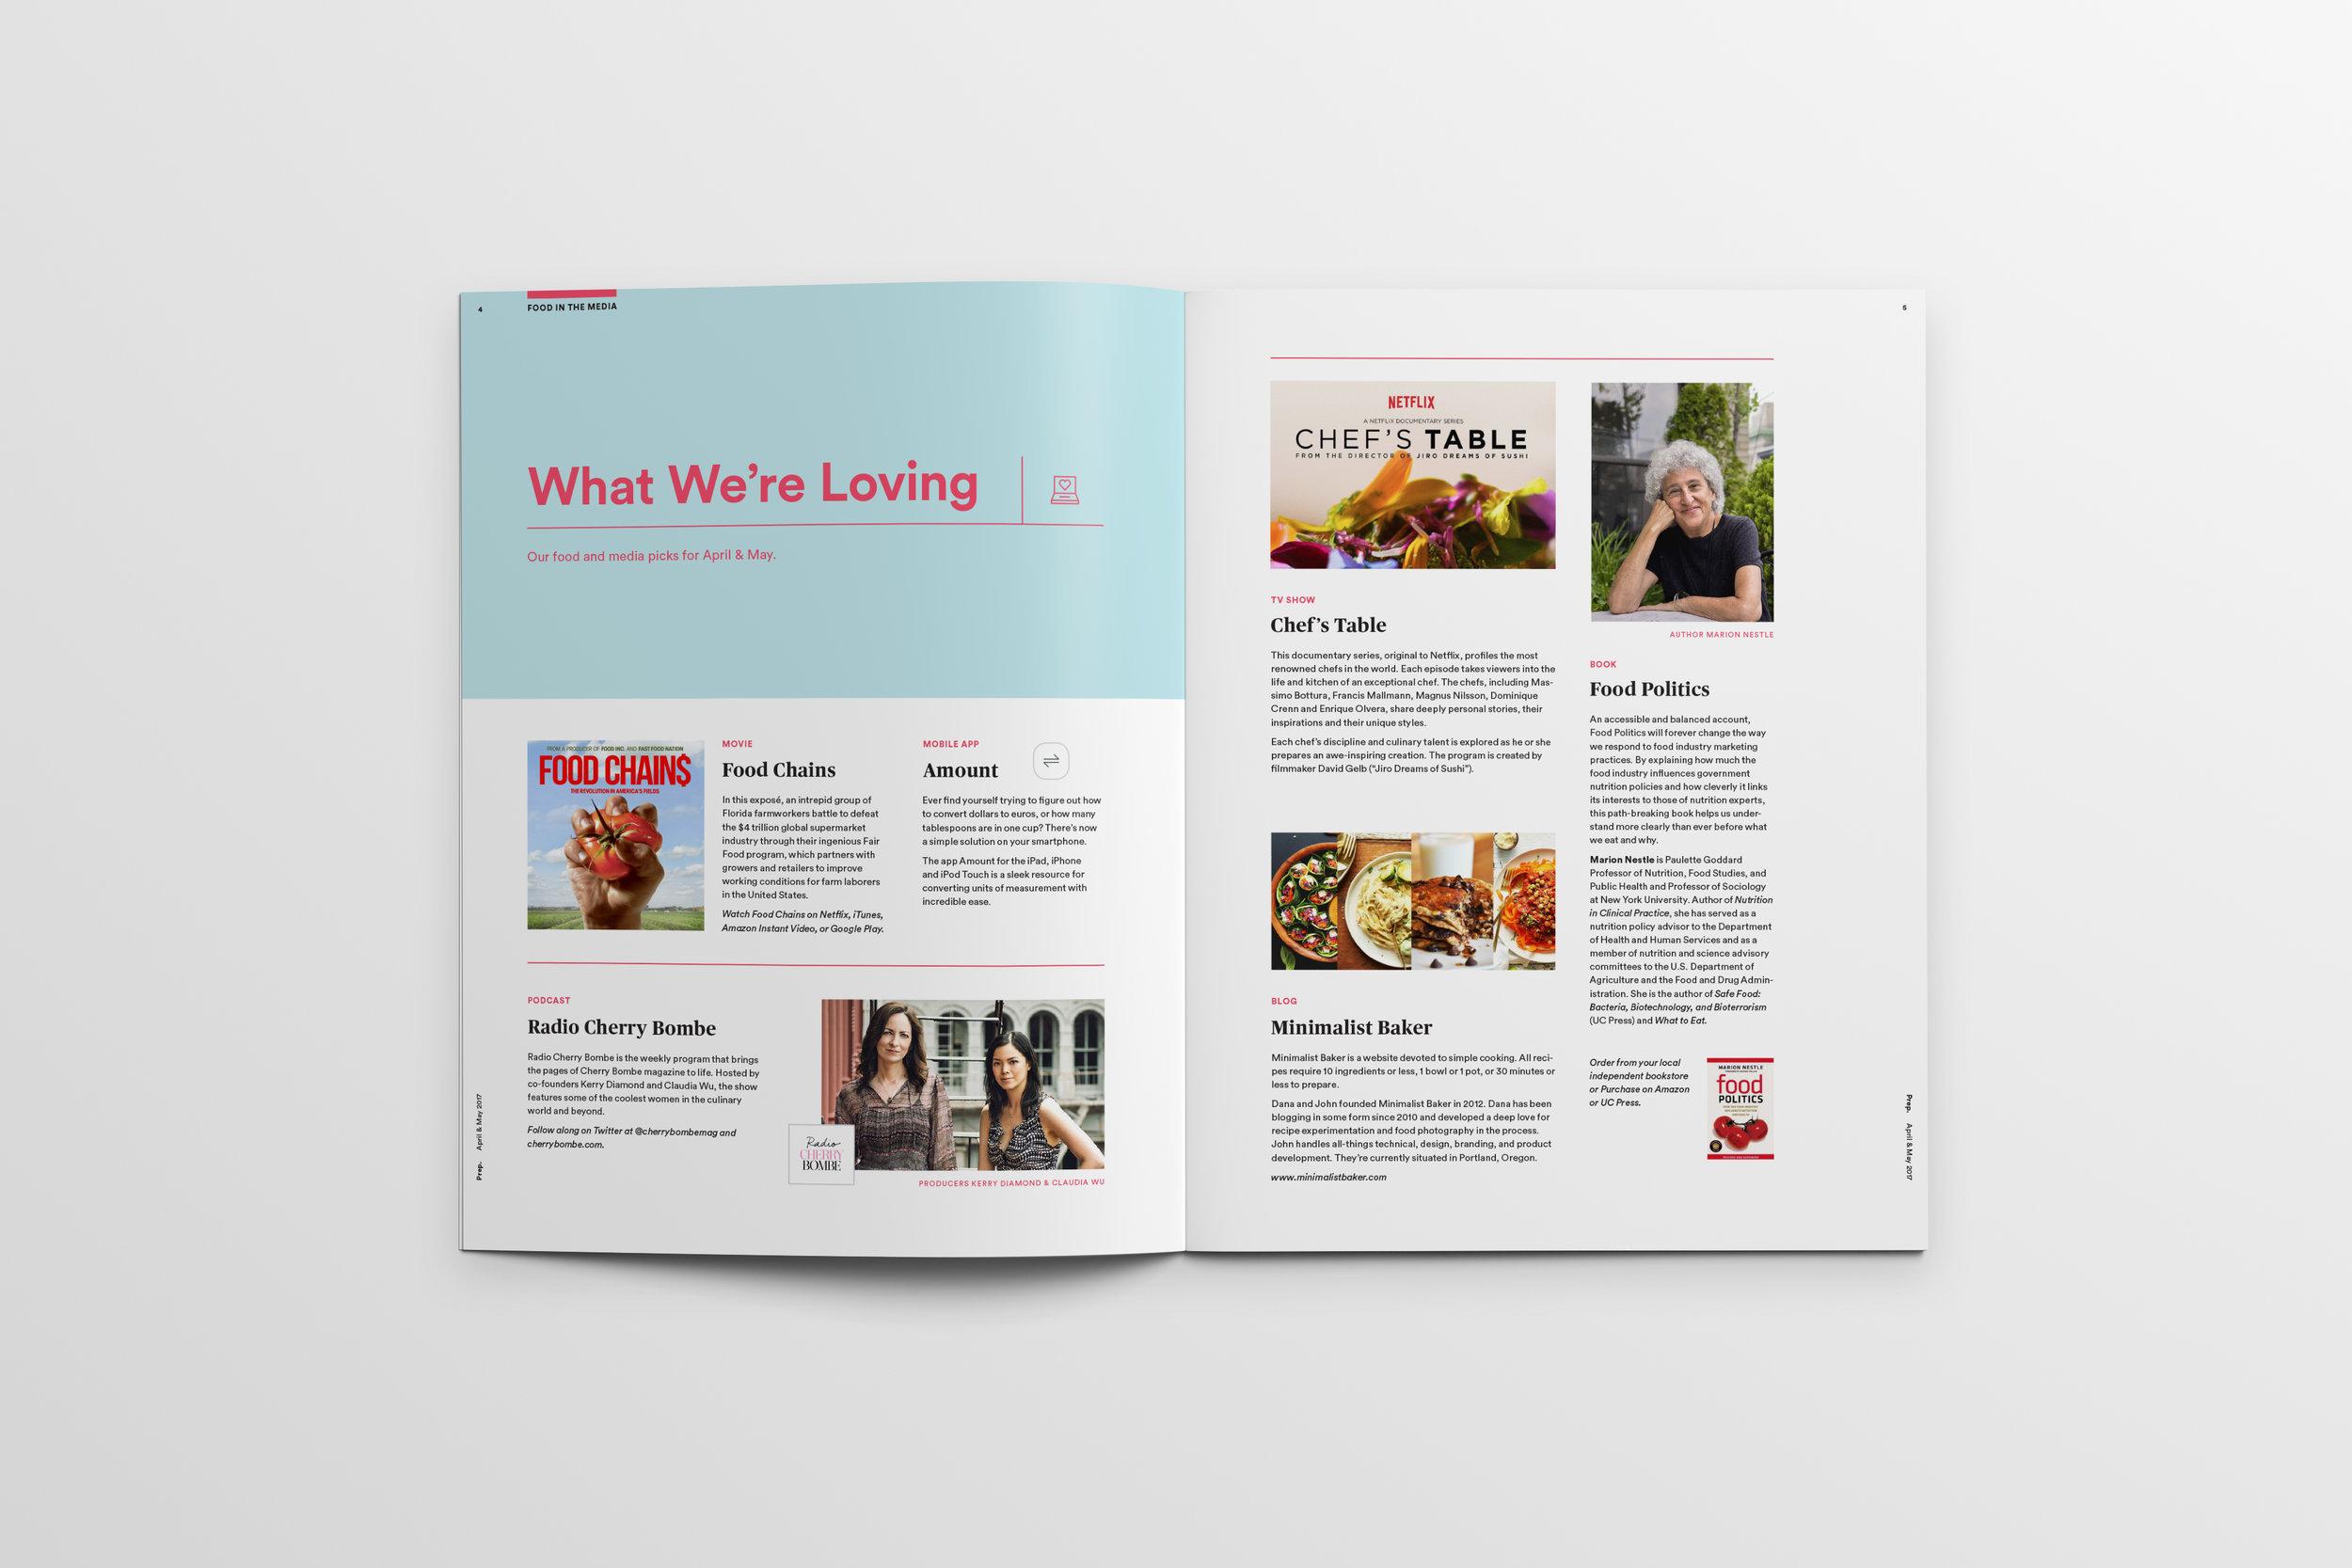 Magazine_Mockup_Pages4-5.jpg